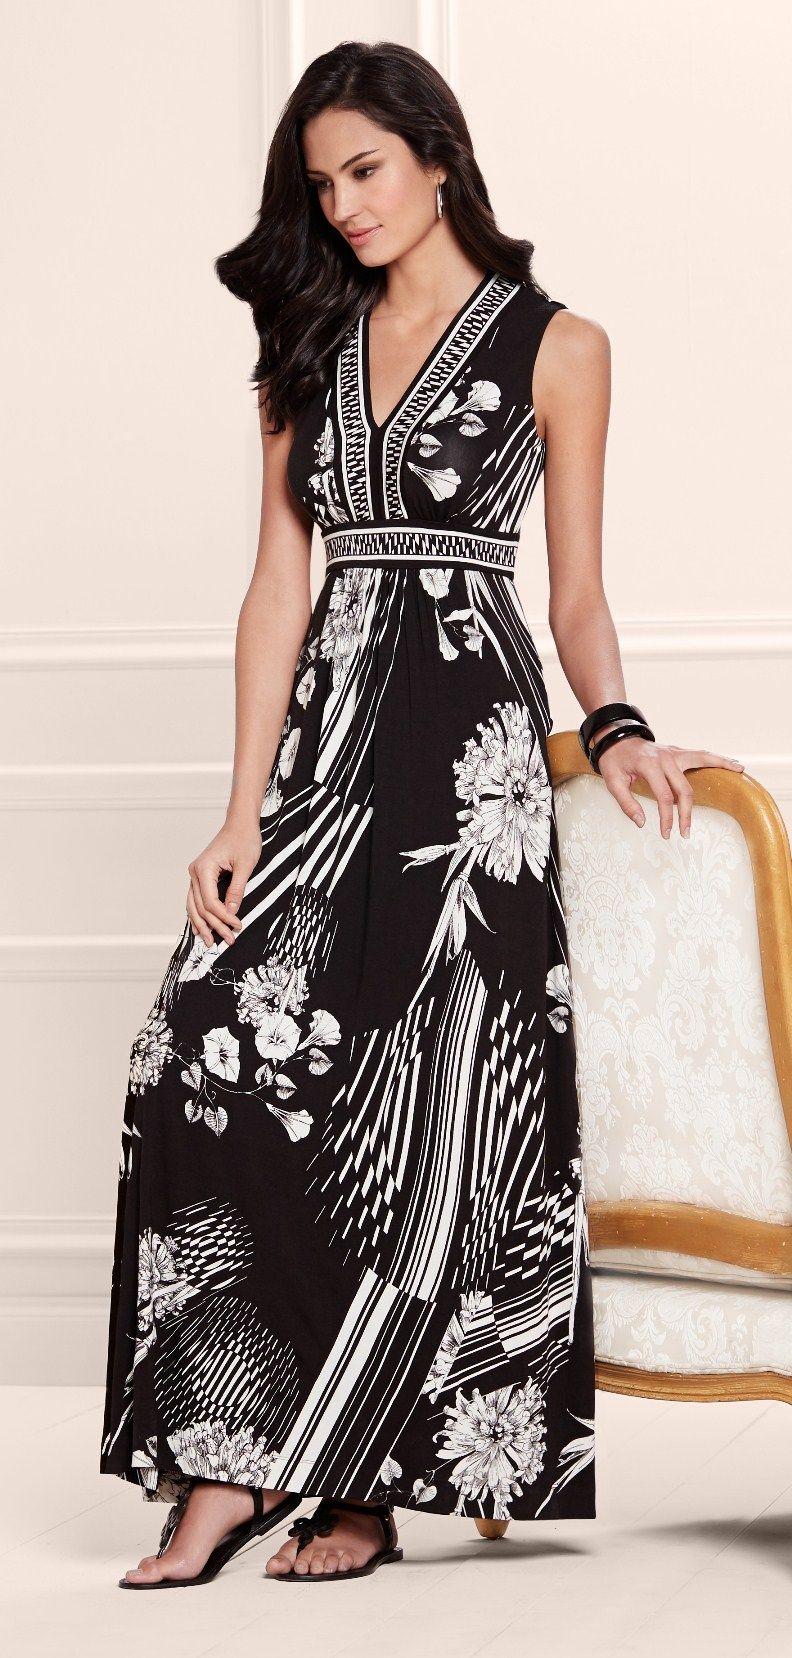 f70d951391 Dahlia Dreams: Soma Border Print Maxi Dress in Destination Floral Print  #LoveSoma